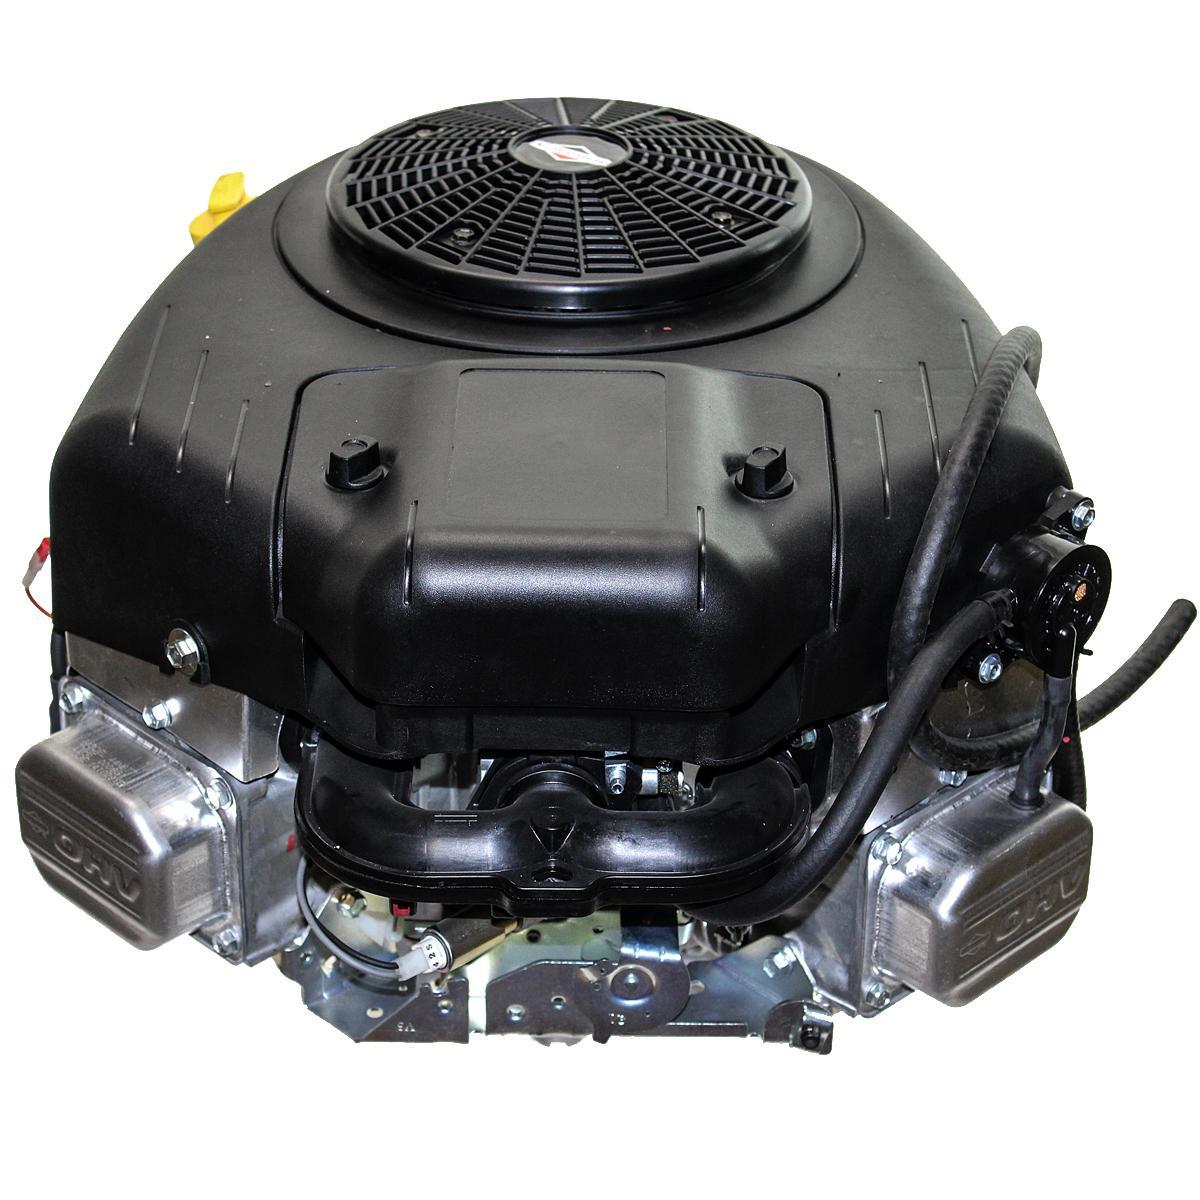 Repower Scag Tiger Cub Kawasaki Fs600v Wiring Diagram 44n677 Tigercub